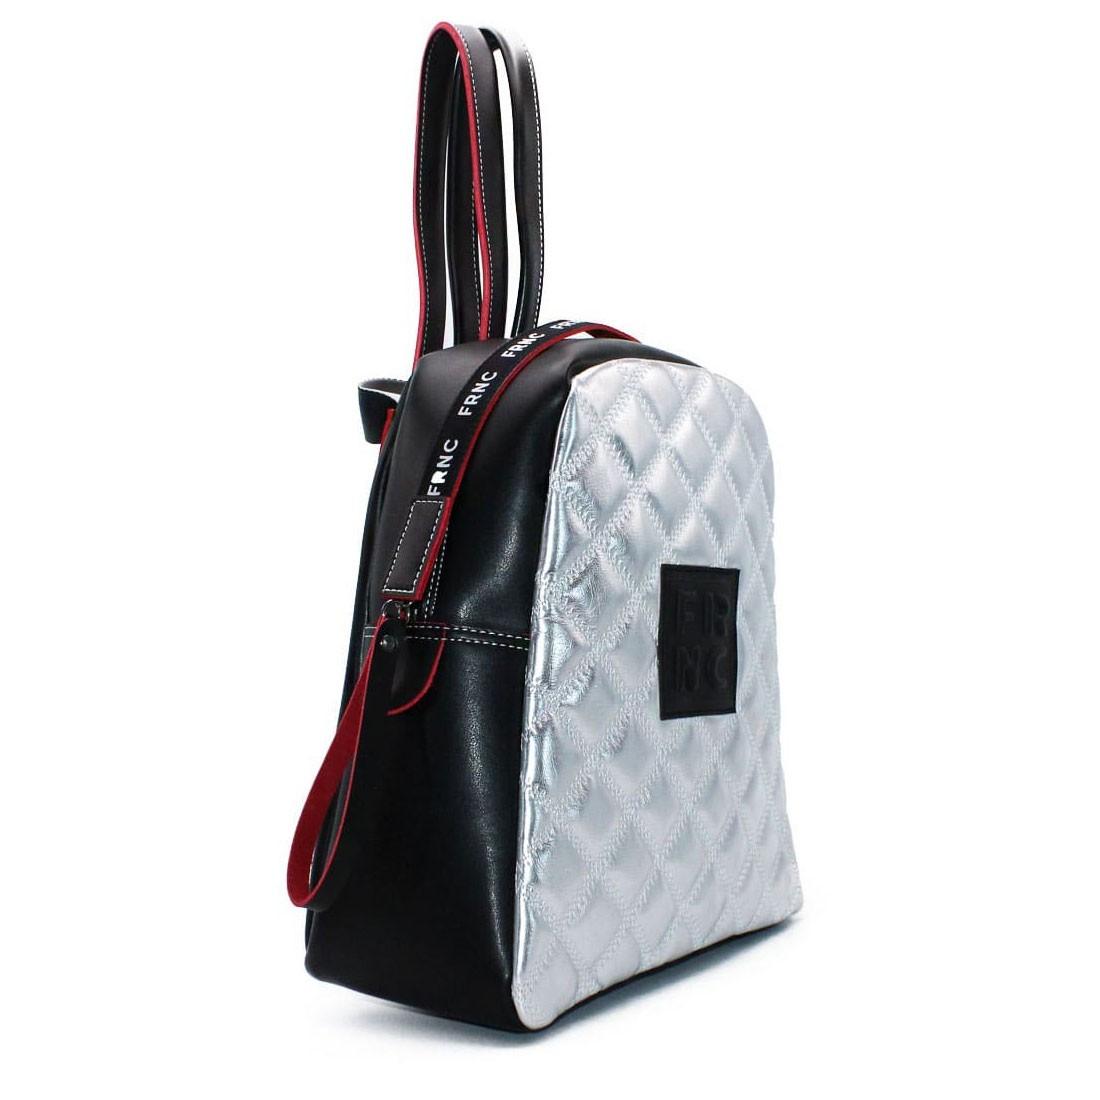 9d236a1eba FRNC FRANCESCO Τσάντα Γυναικεία Πλάτης-Backpack 1202 Μαύρο-Ασημί Kαπιτονέ –  IShoeStore